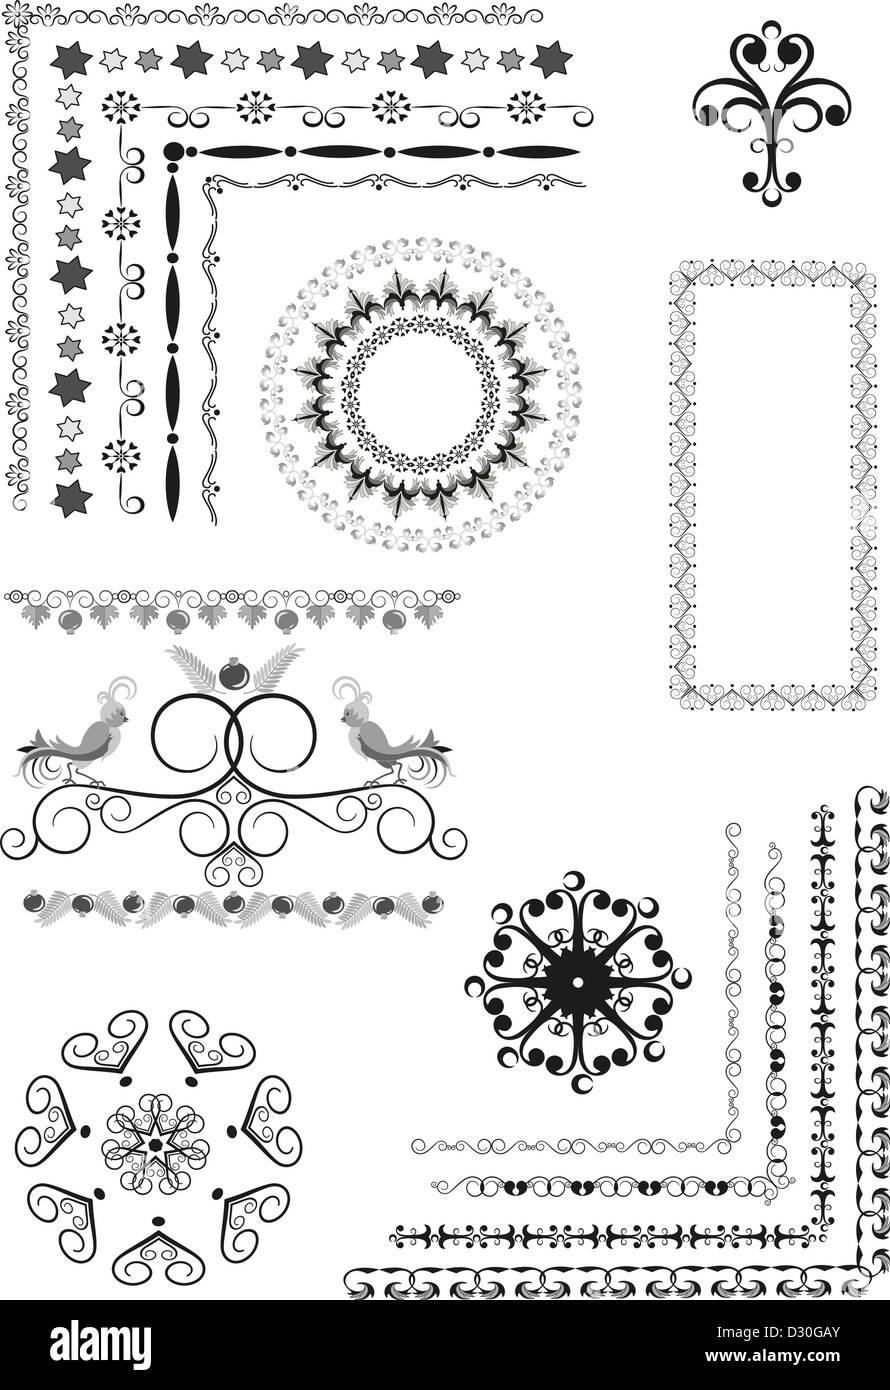 Decorative border, frame of ornament - Stock Image